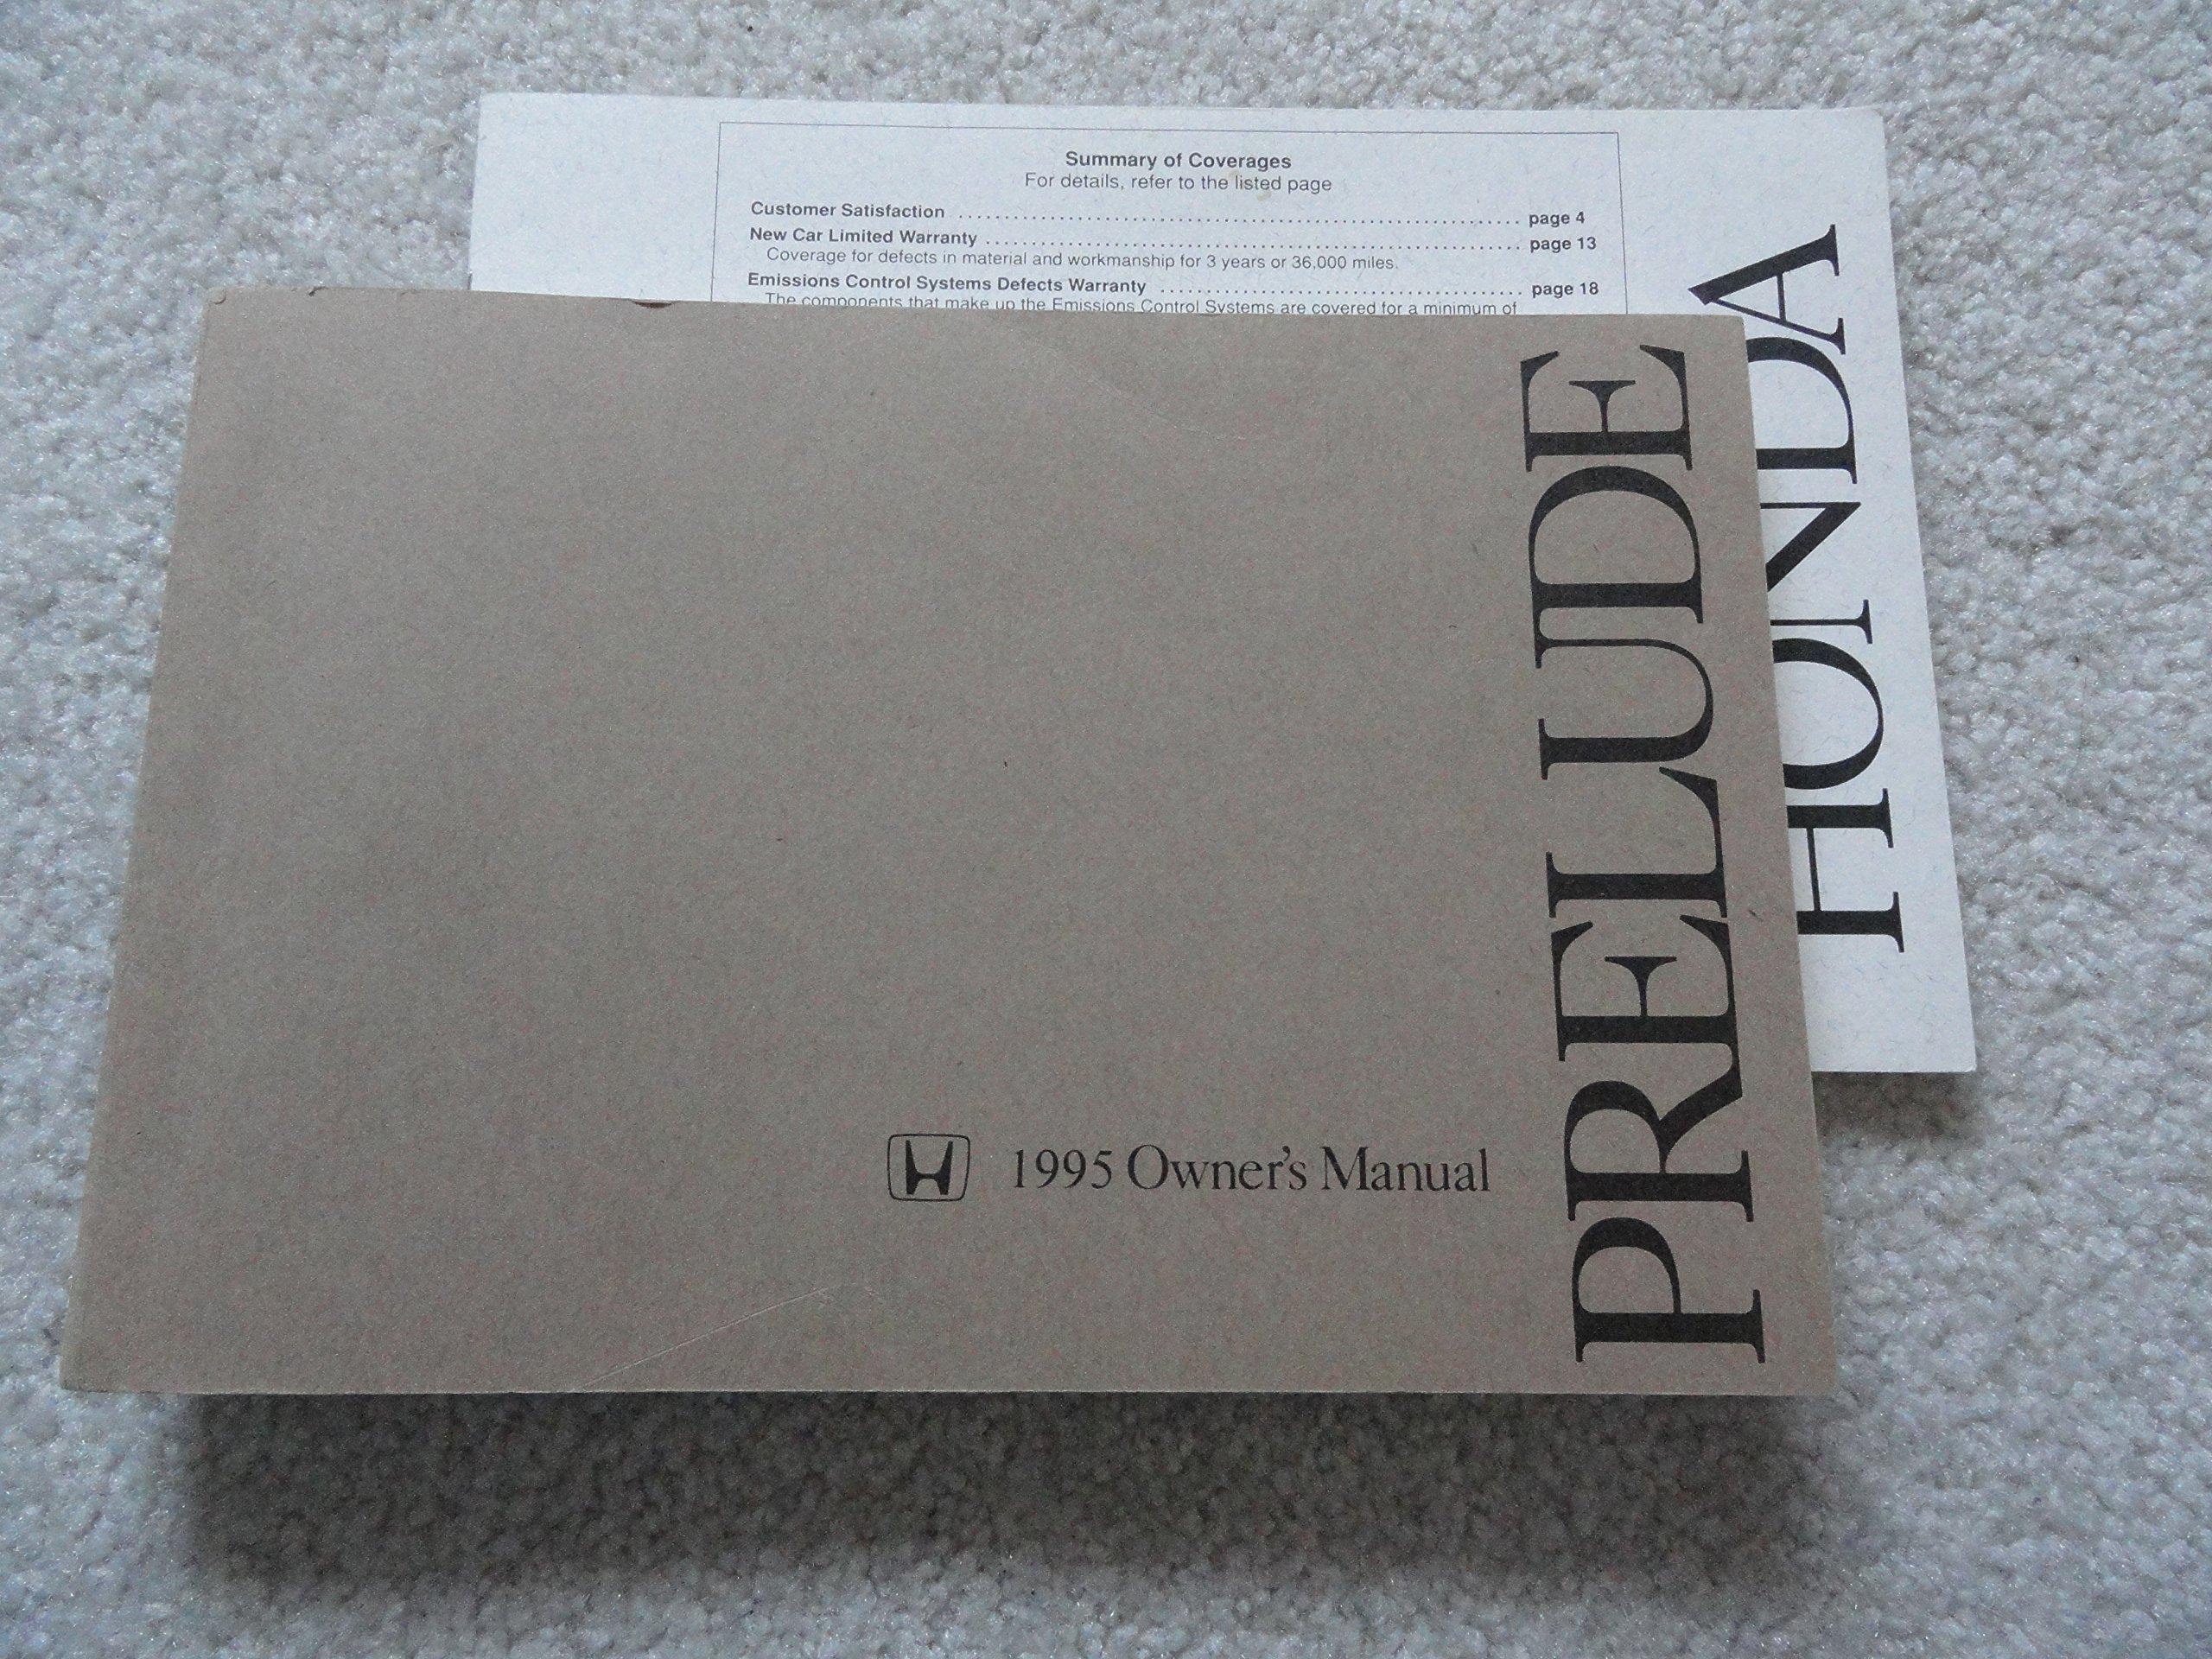 1995 honda prelude owners manual honda amazon com books rh amazon com 2000 Honda Prelude 2000 Honda Prelude